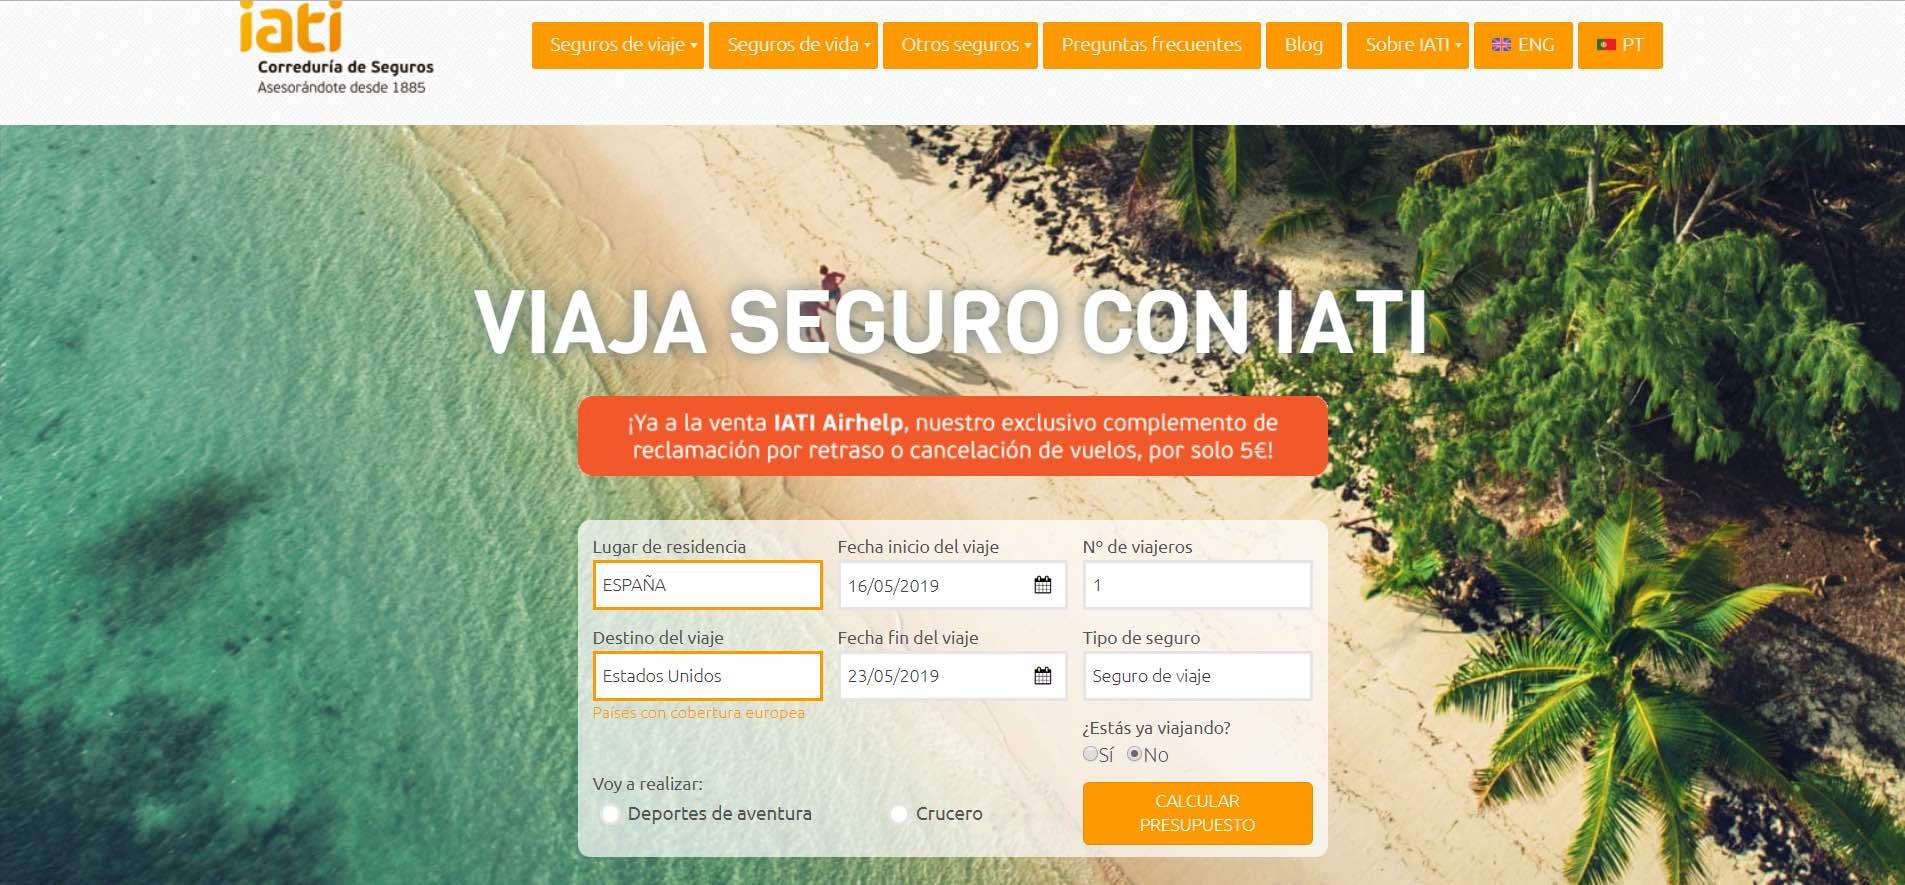 Curiosidades sobre Cuba seguro de viajes Iati